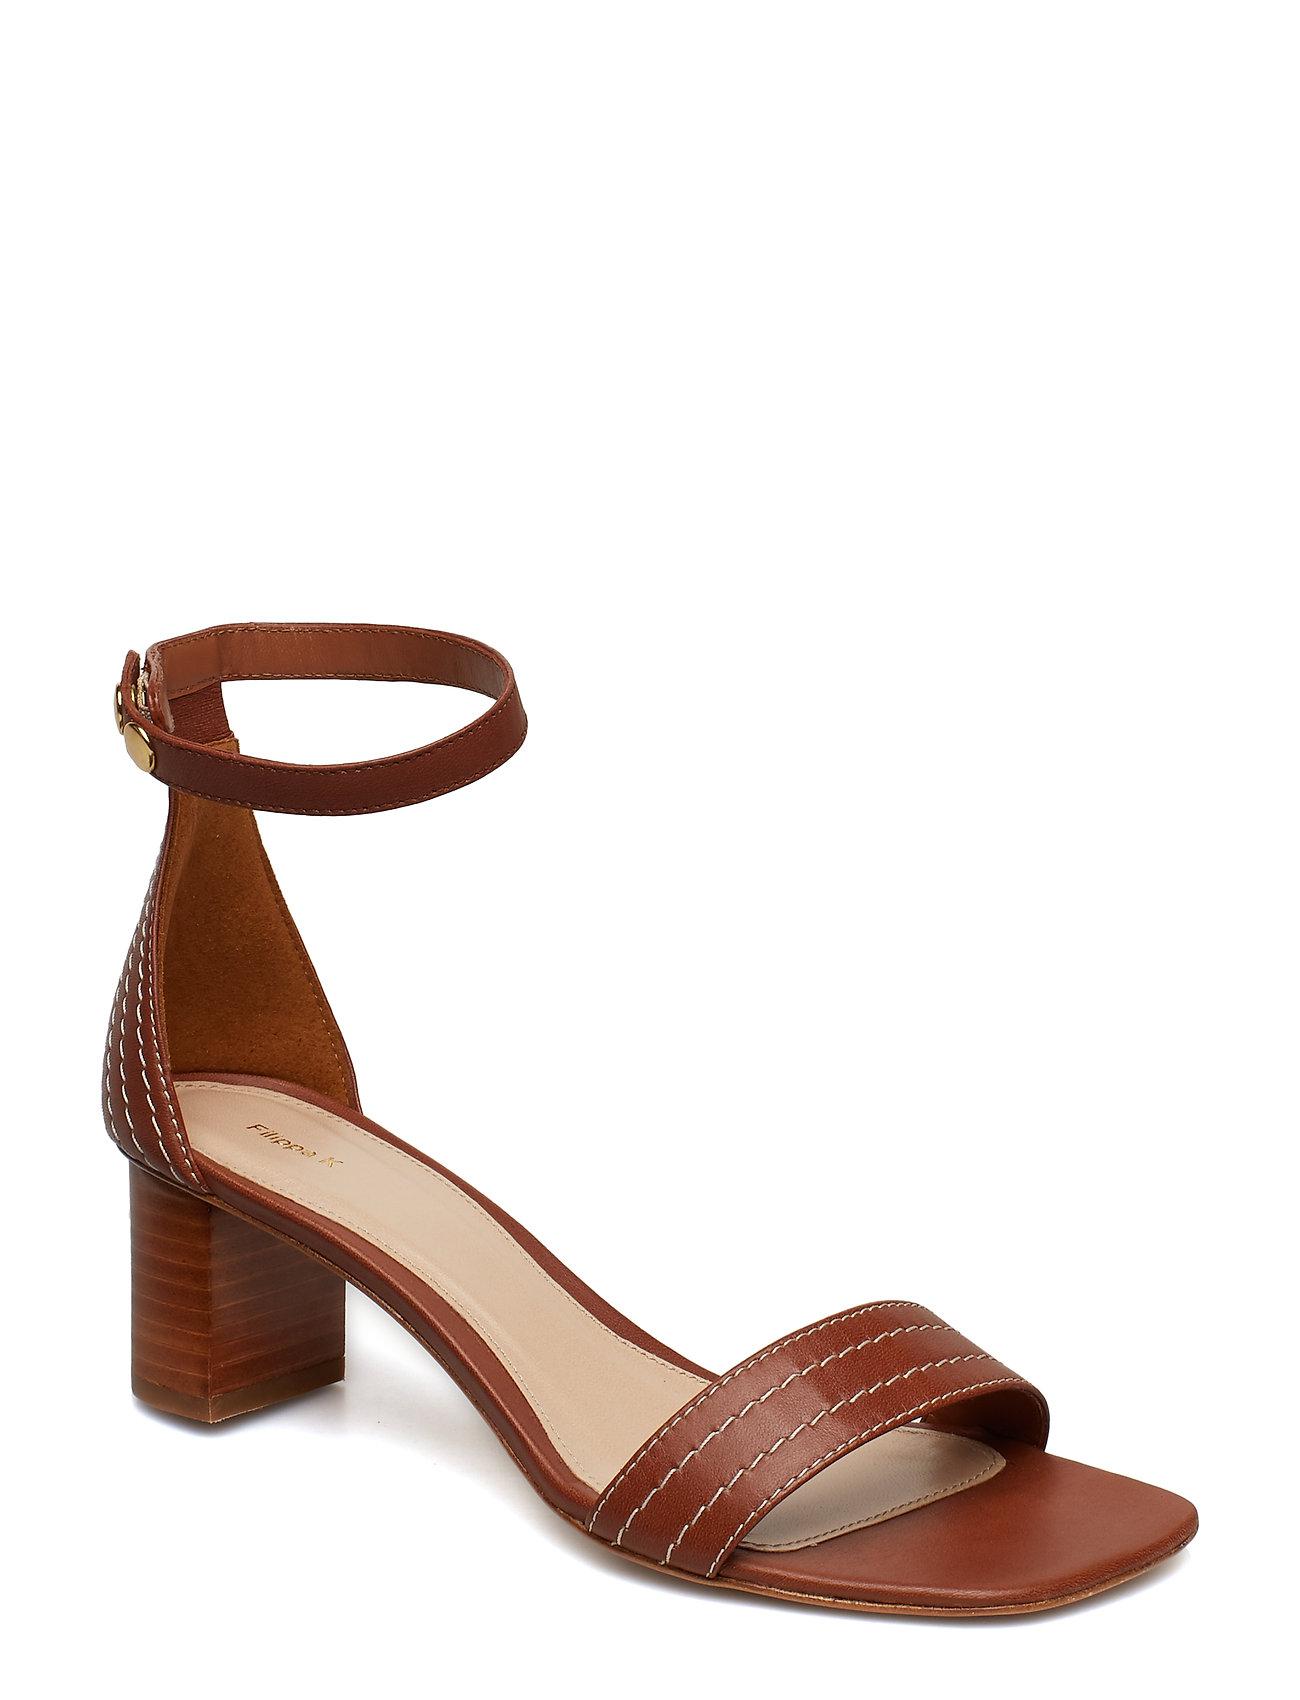 Filippa K Belinda Mid Heel Sandal